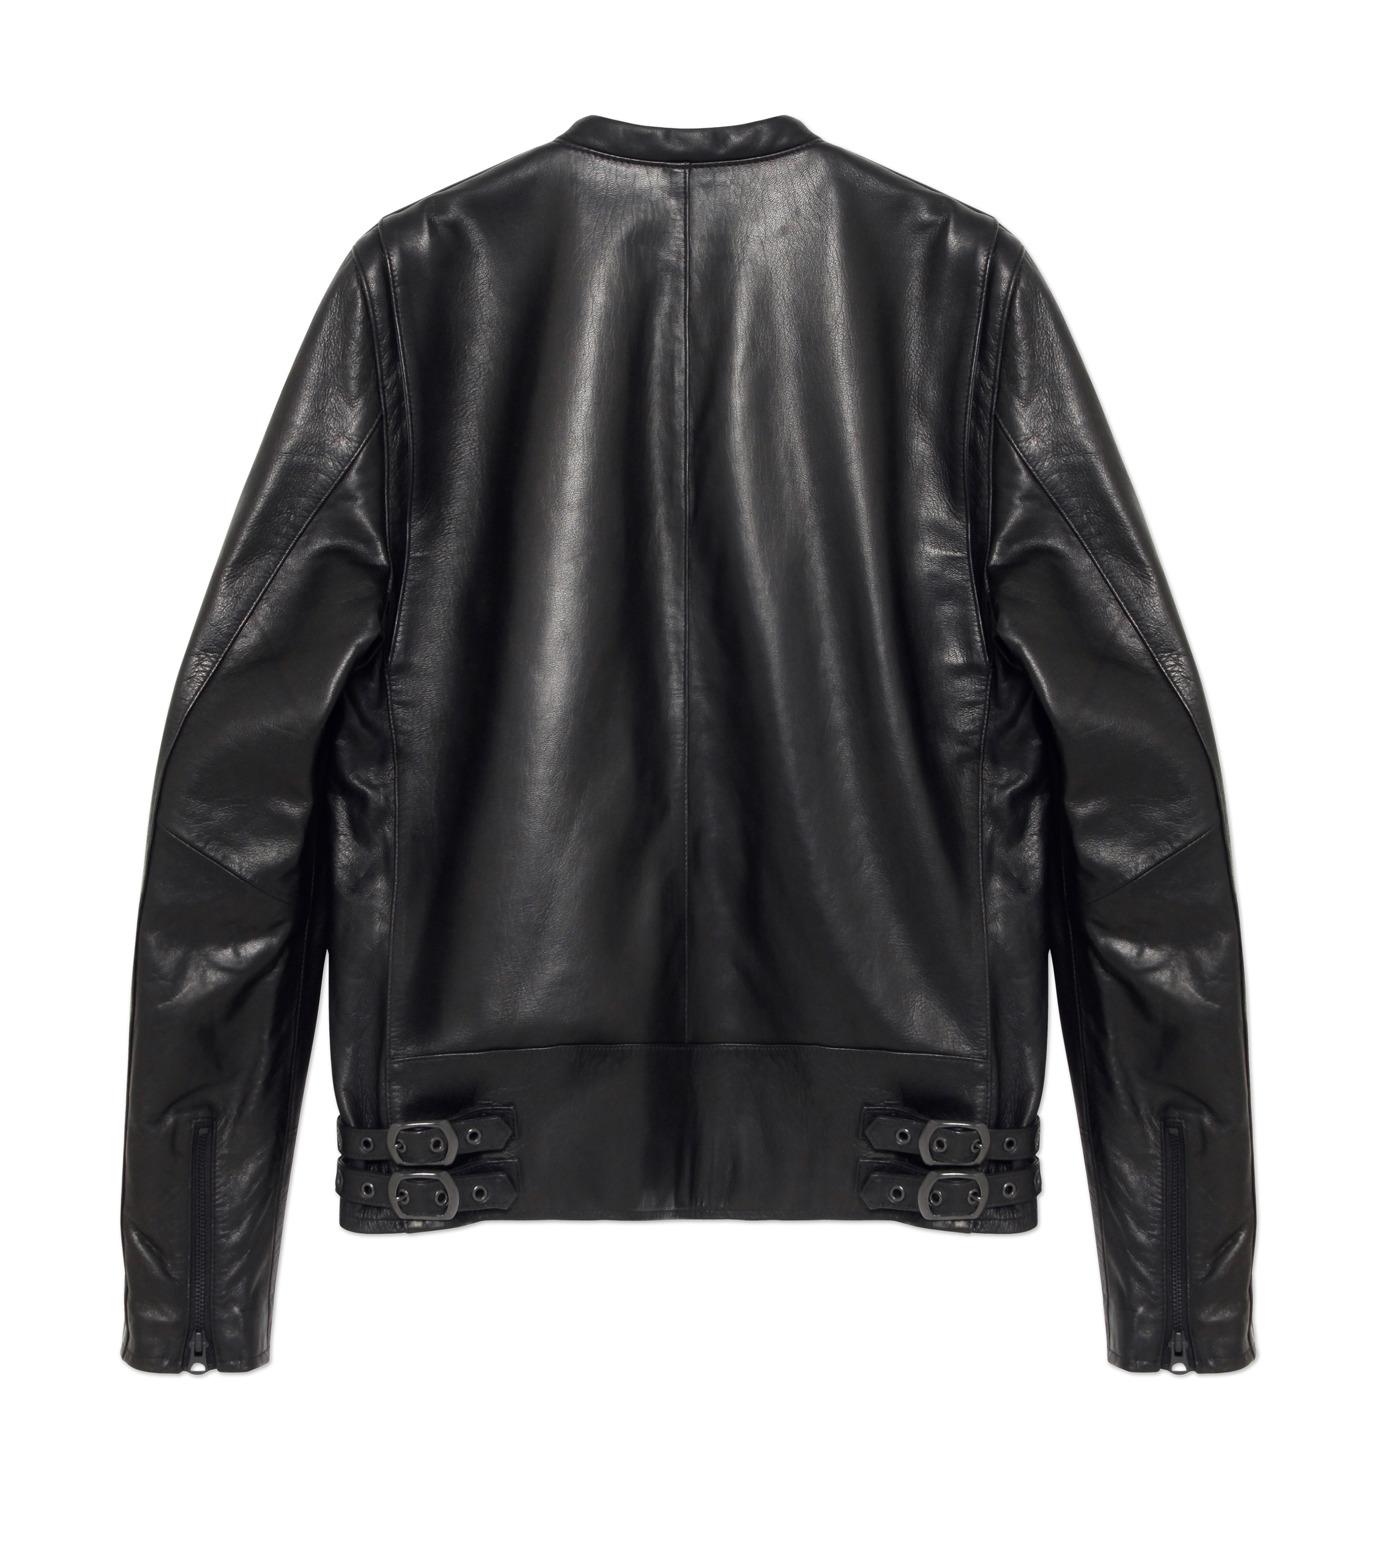 HL HEDDIE LOVU(エイチエル・エディールーヴ)のMINIMUM COLLAR LEATHER JACKET-BLACK(ジャケット/jacket)-18S94006-13 拡大詳細画像2